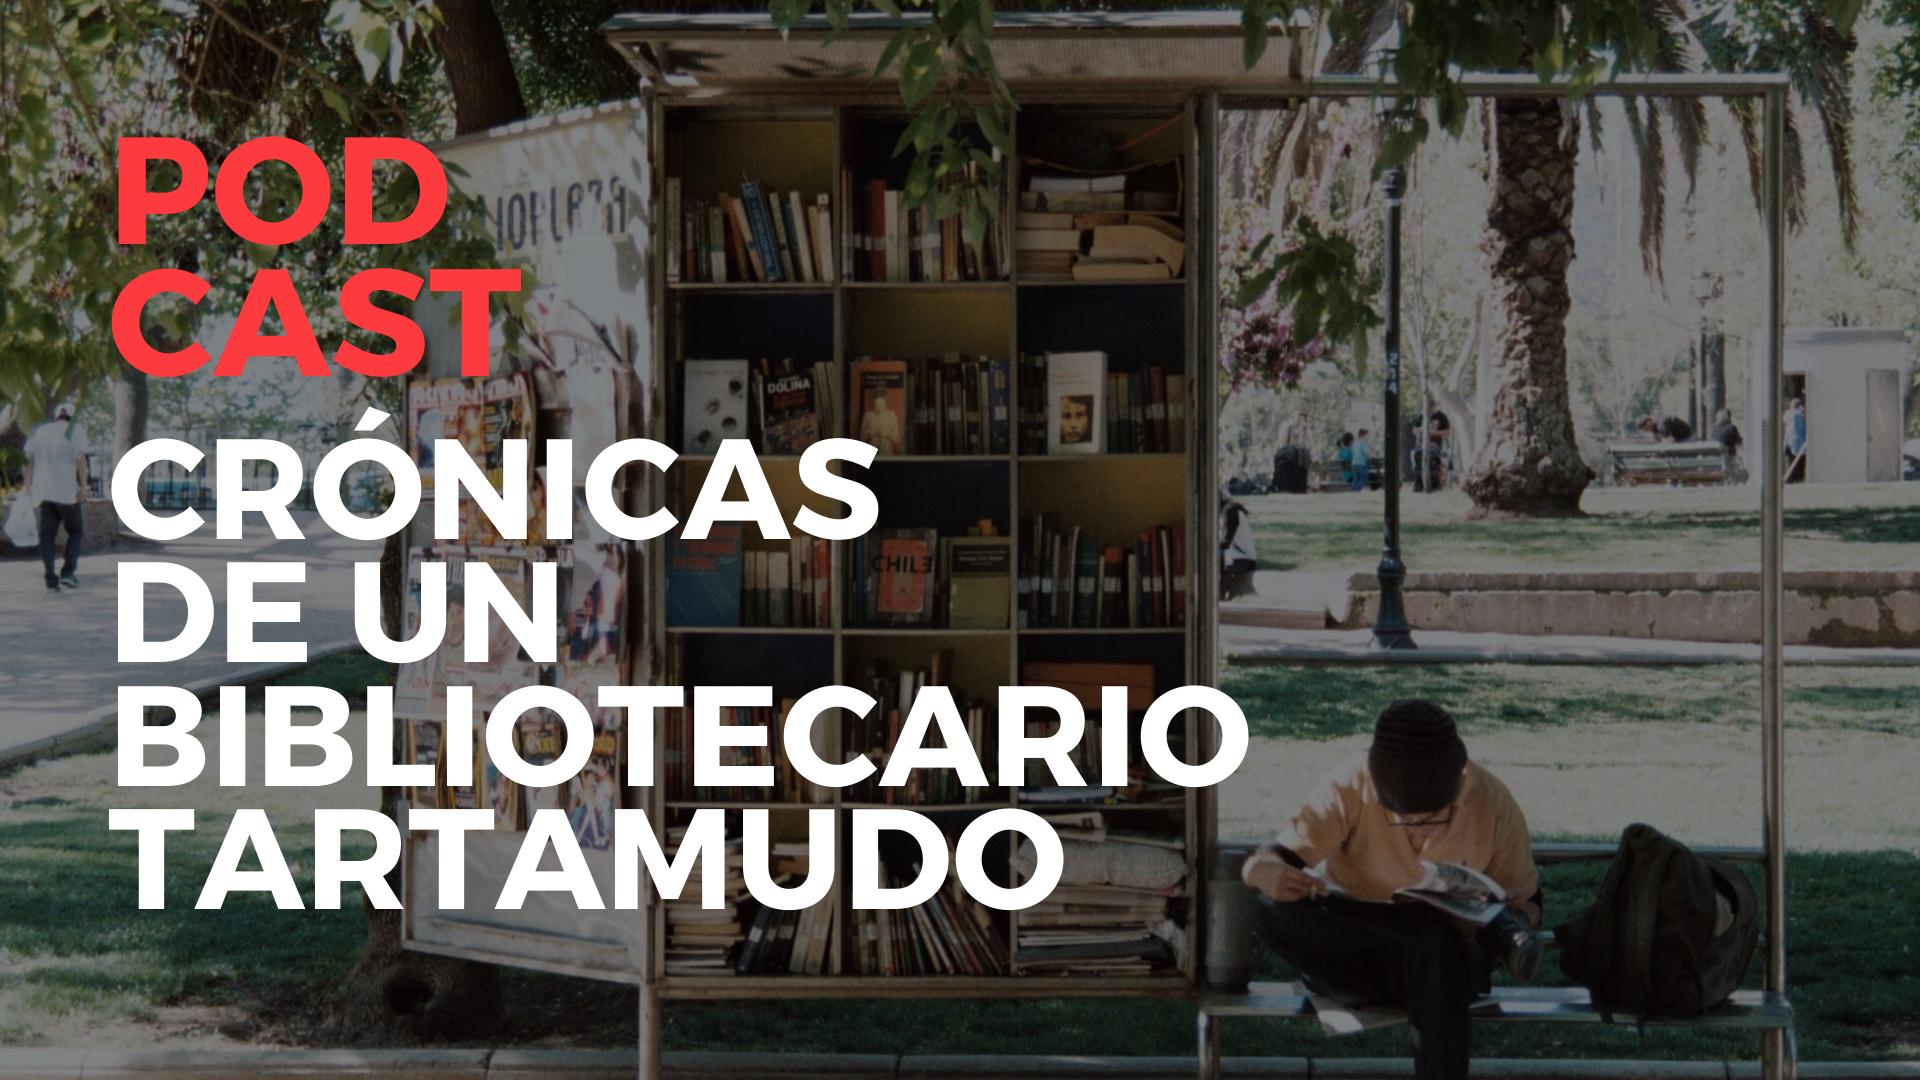 Podcast: Crónicas de un Bibliotecario Tartamudo